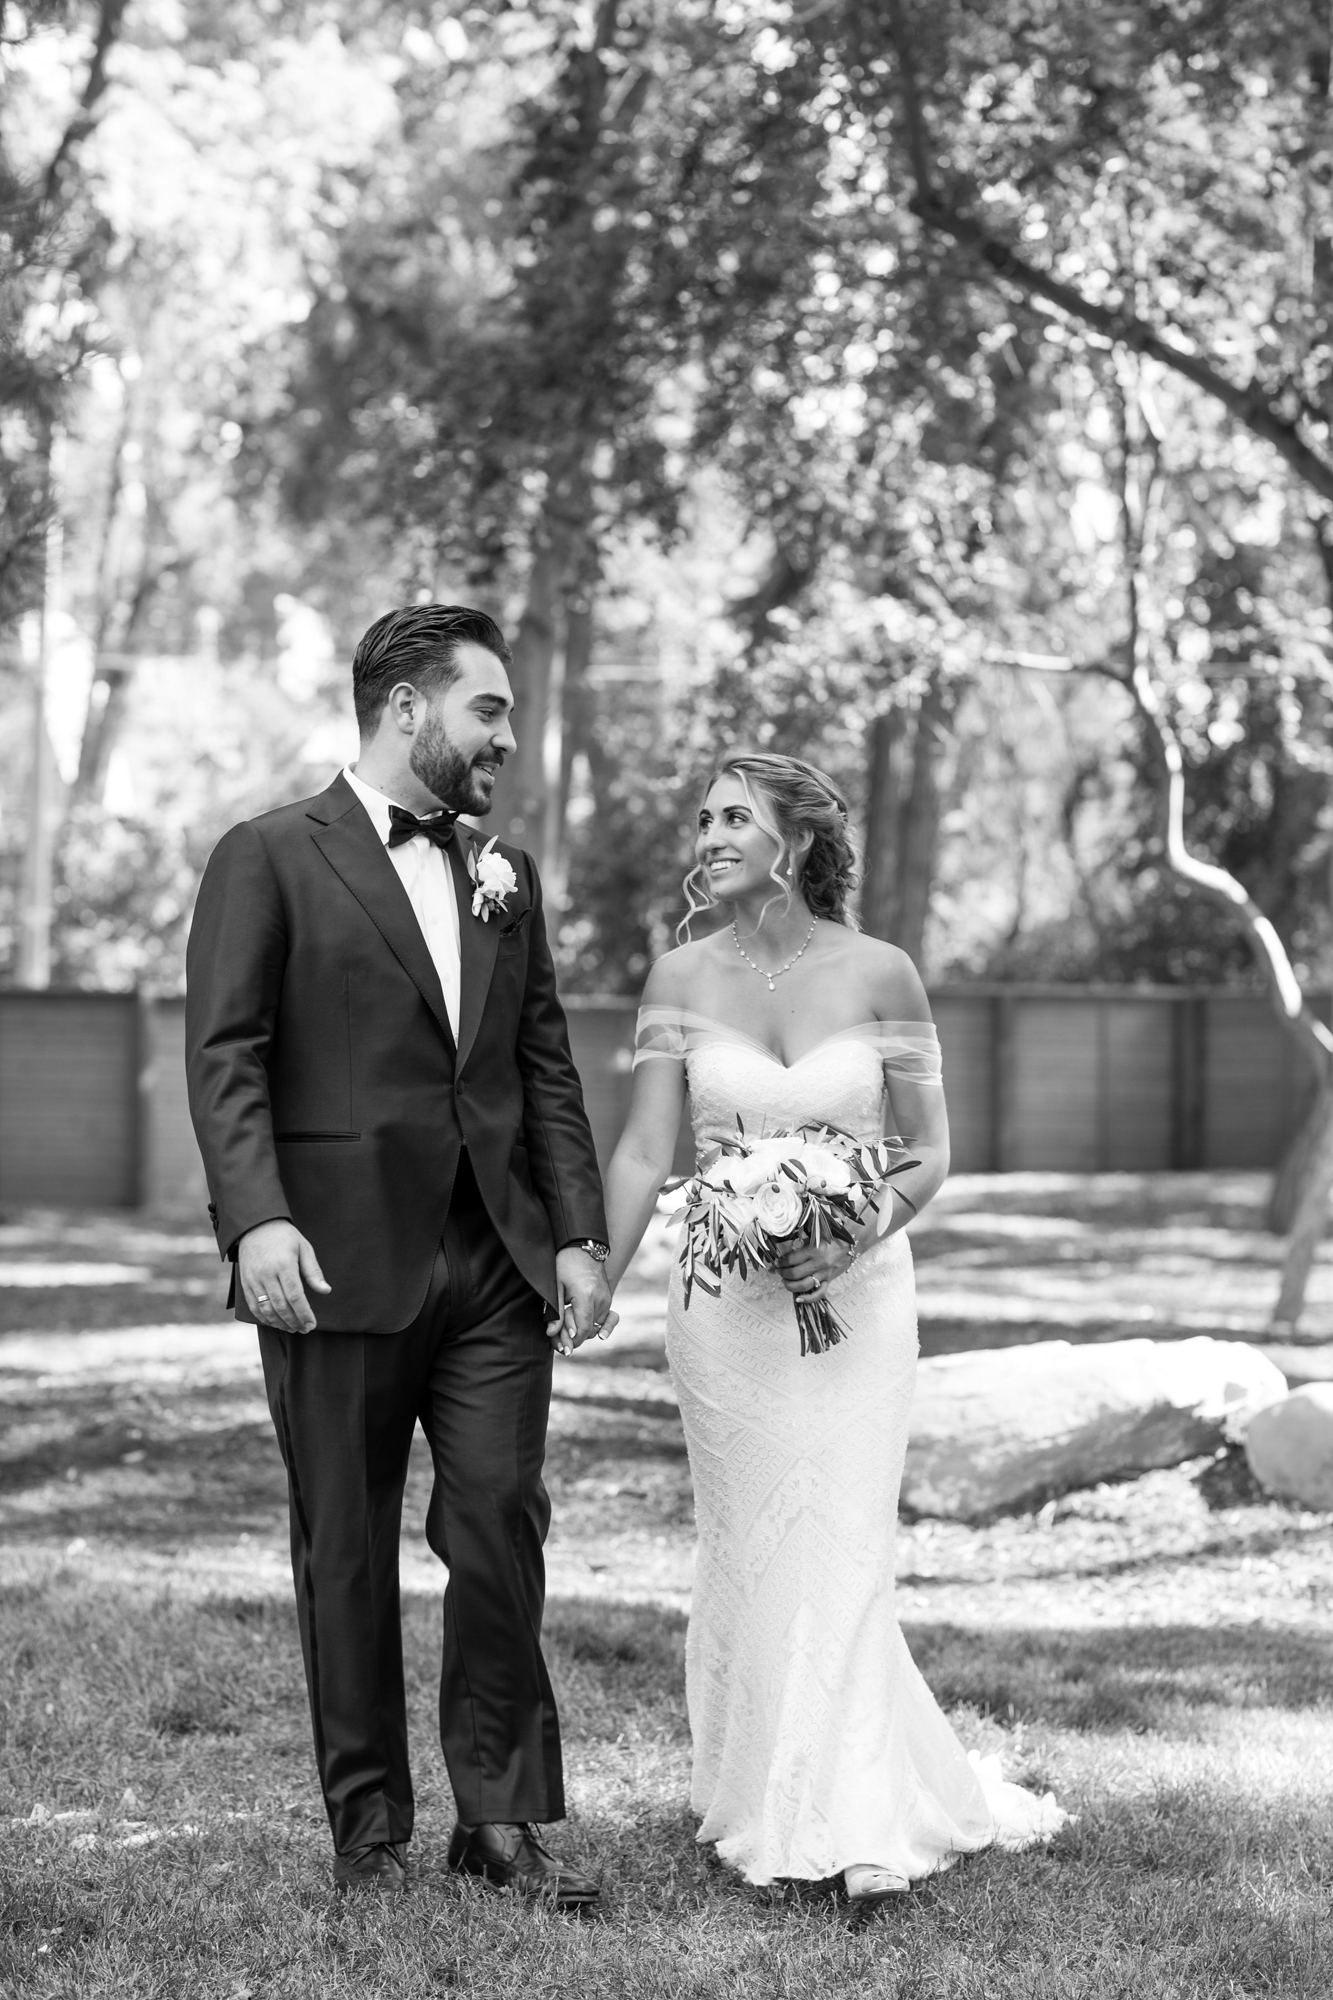 greek-wedding-salt-lake-city-utah-32.jpg